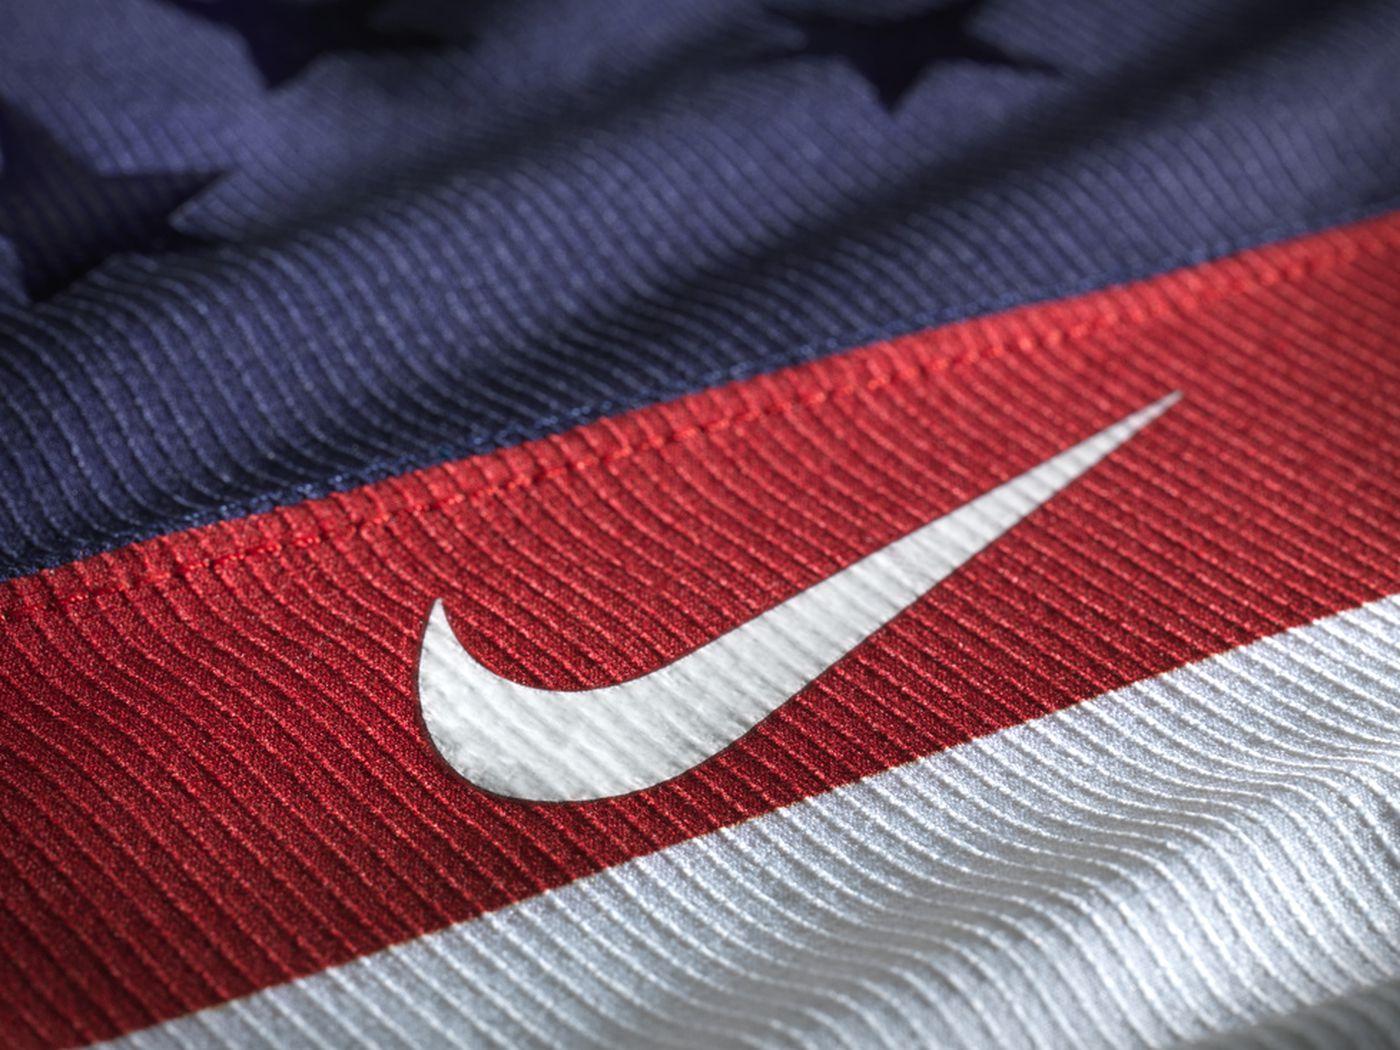 the best attitude 1e79a 5e976 USA Olympic hockey jerseys ruined by Nike s gimmicks - SBNation.com